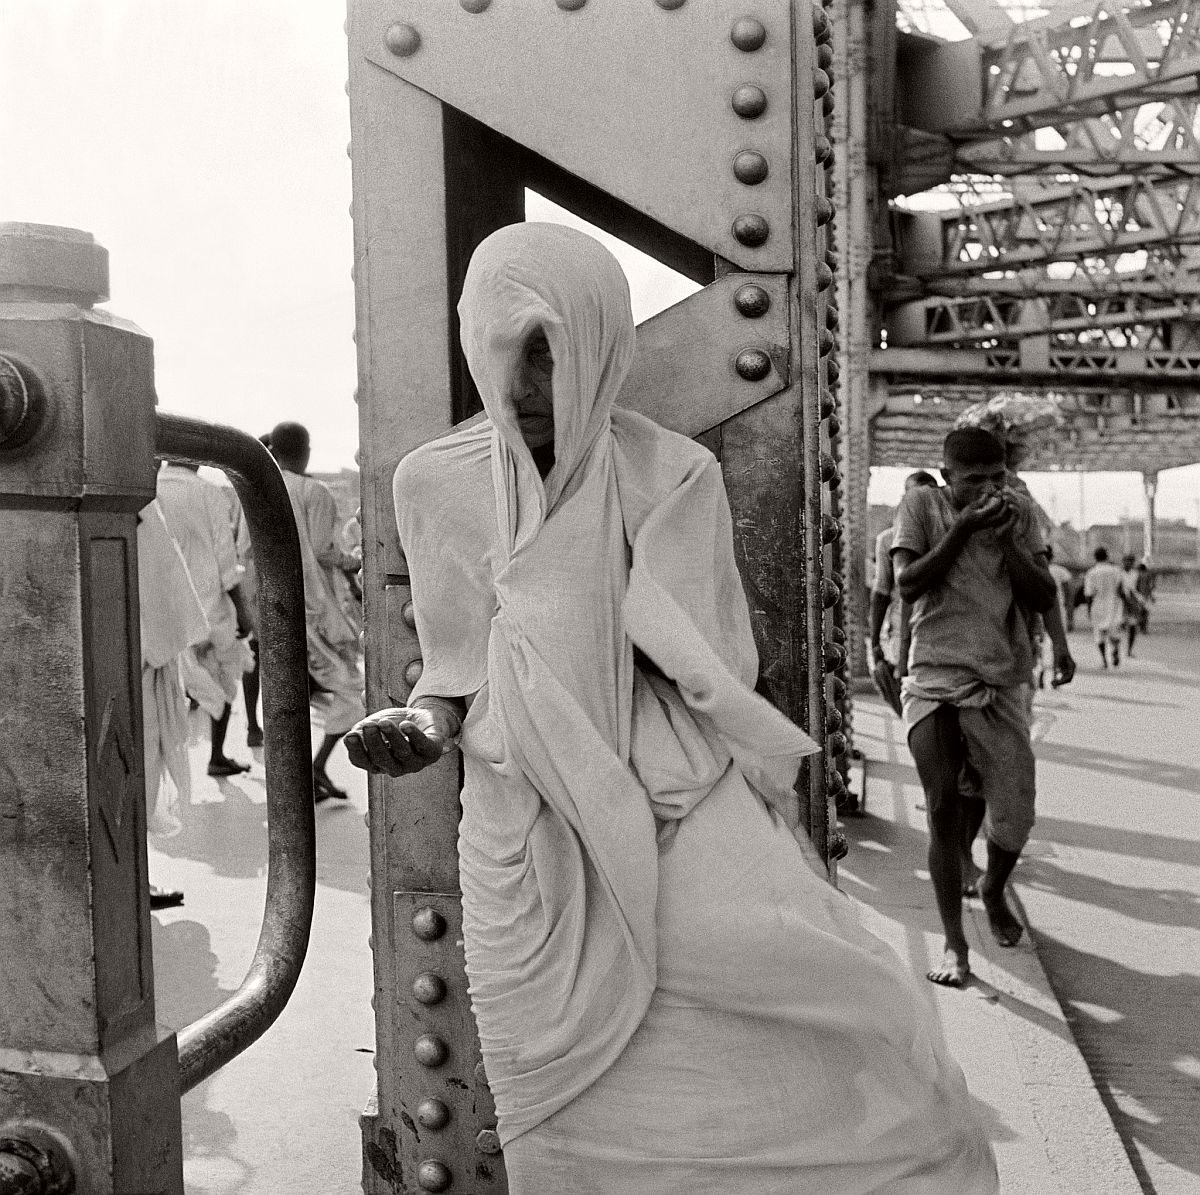 photojournalist-and-fashion-photographer-frank-horvat-03